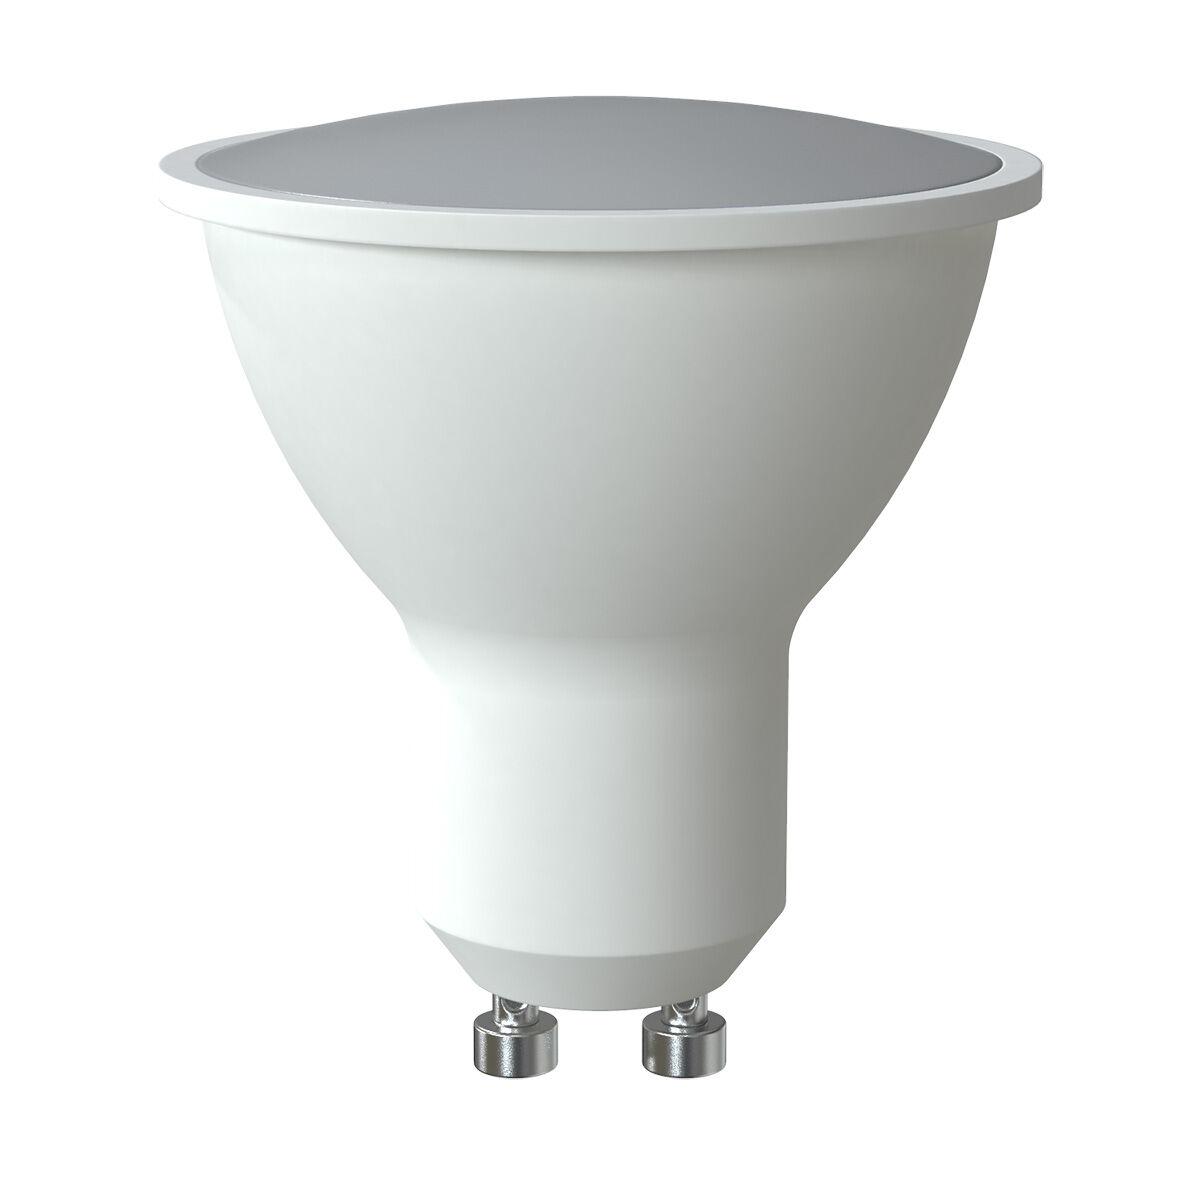 Simple Lighting GU10 5W LED Spotlight - Cool White, Natural White or Warm White